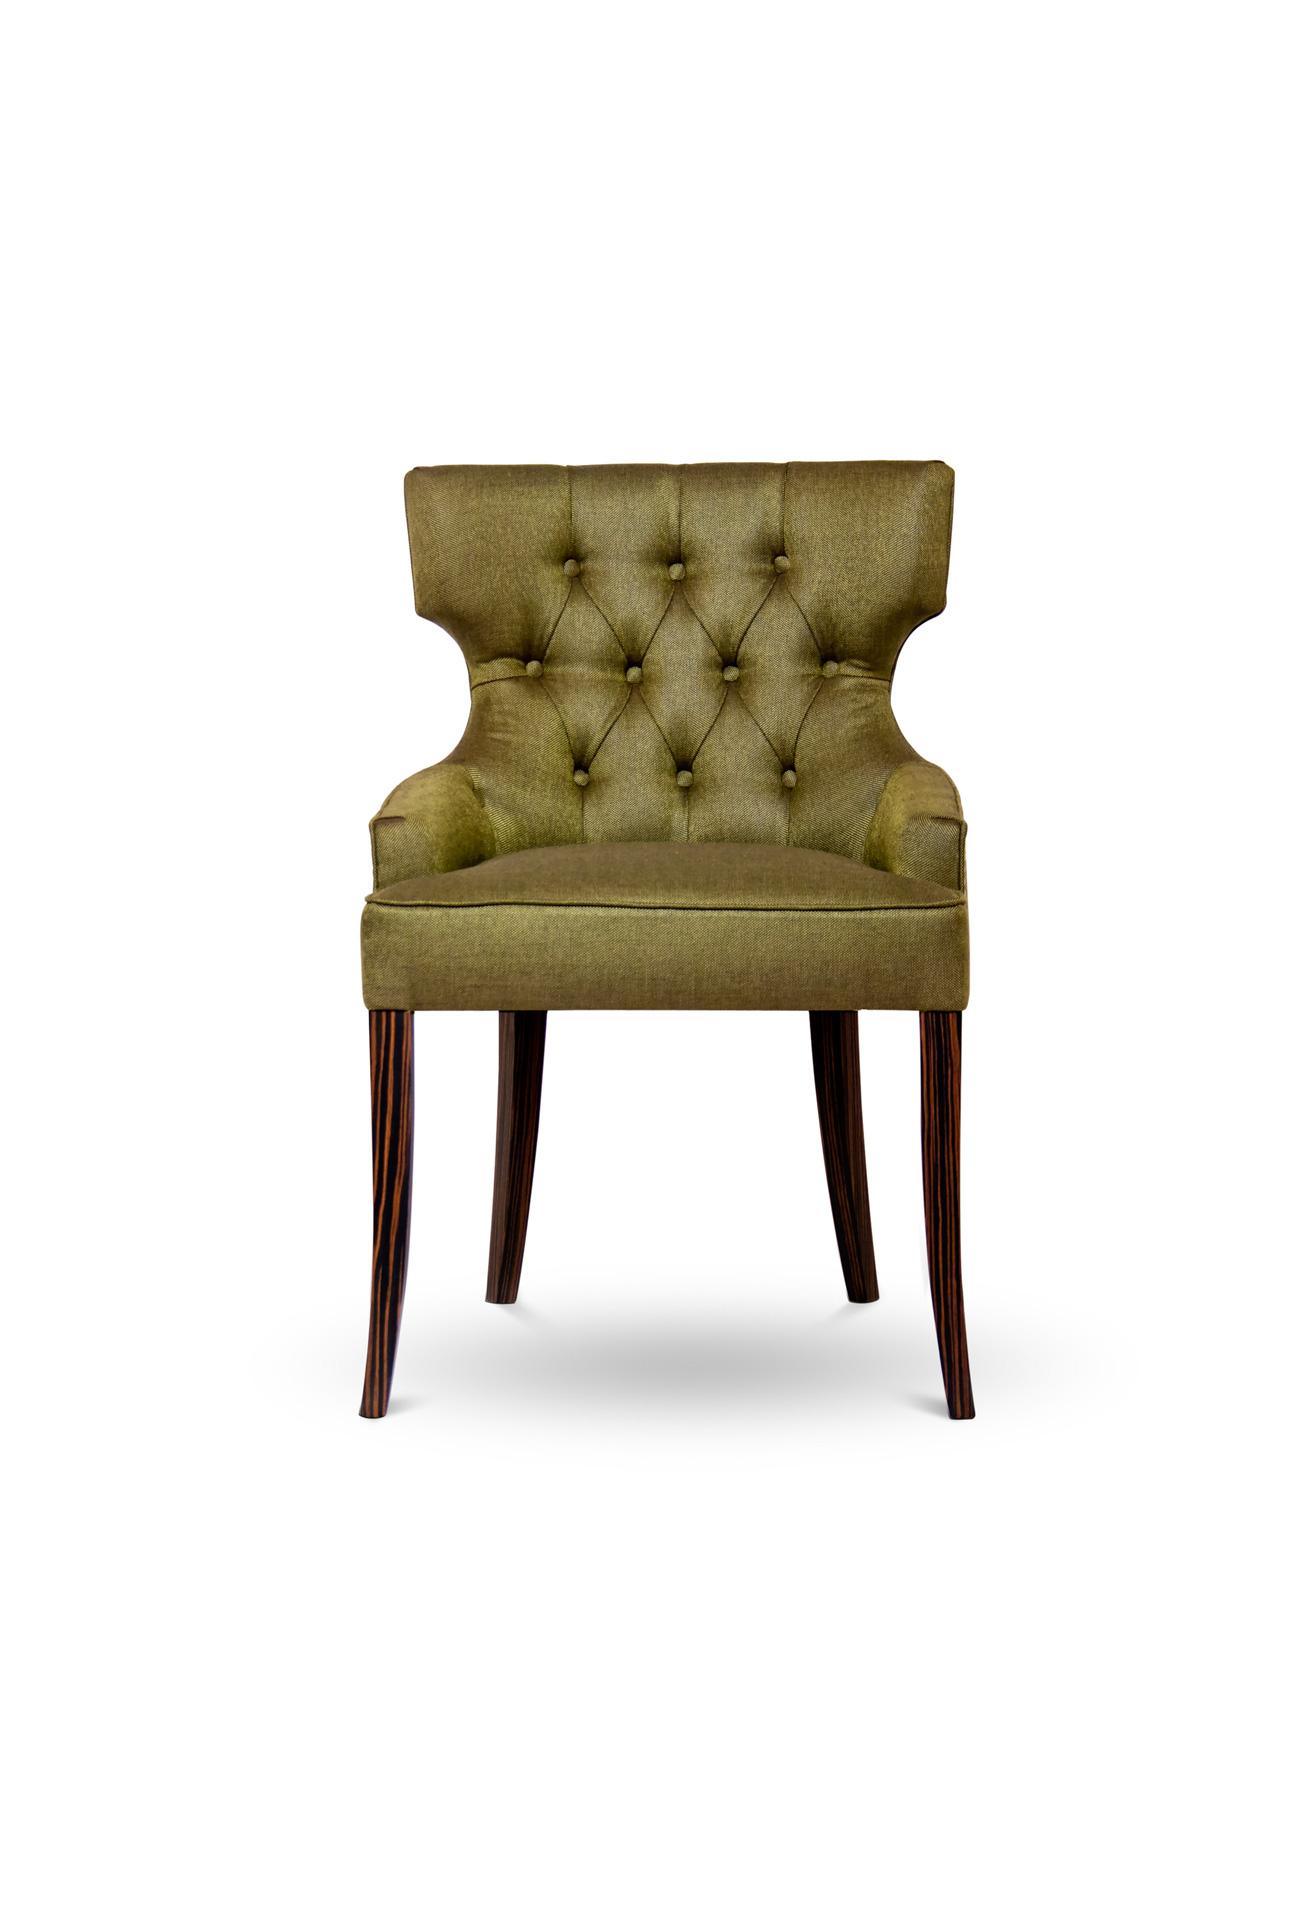 MAORI Modern Upholstered Dining Chair By BRABBU